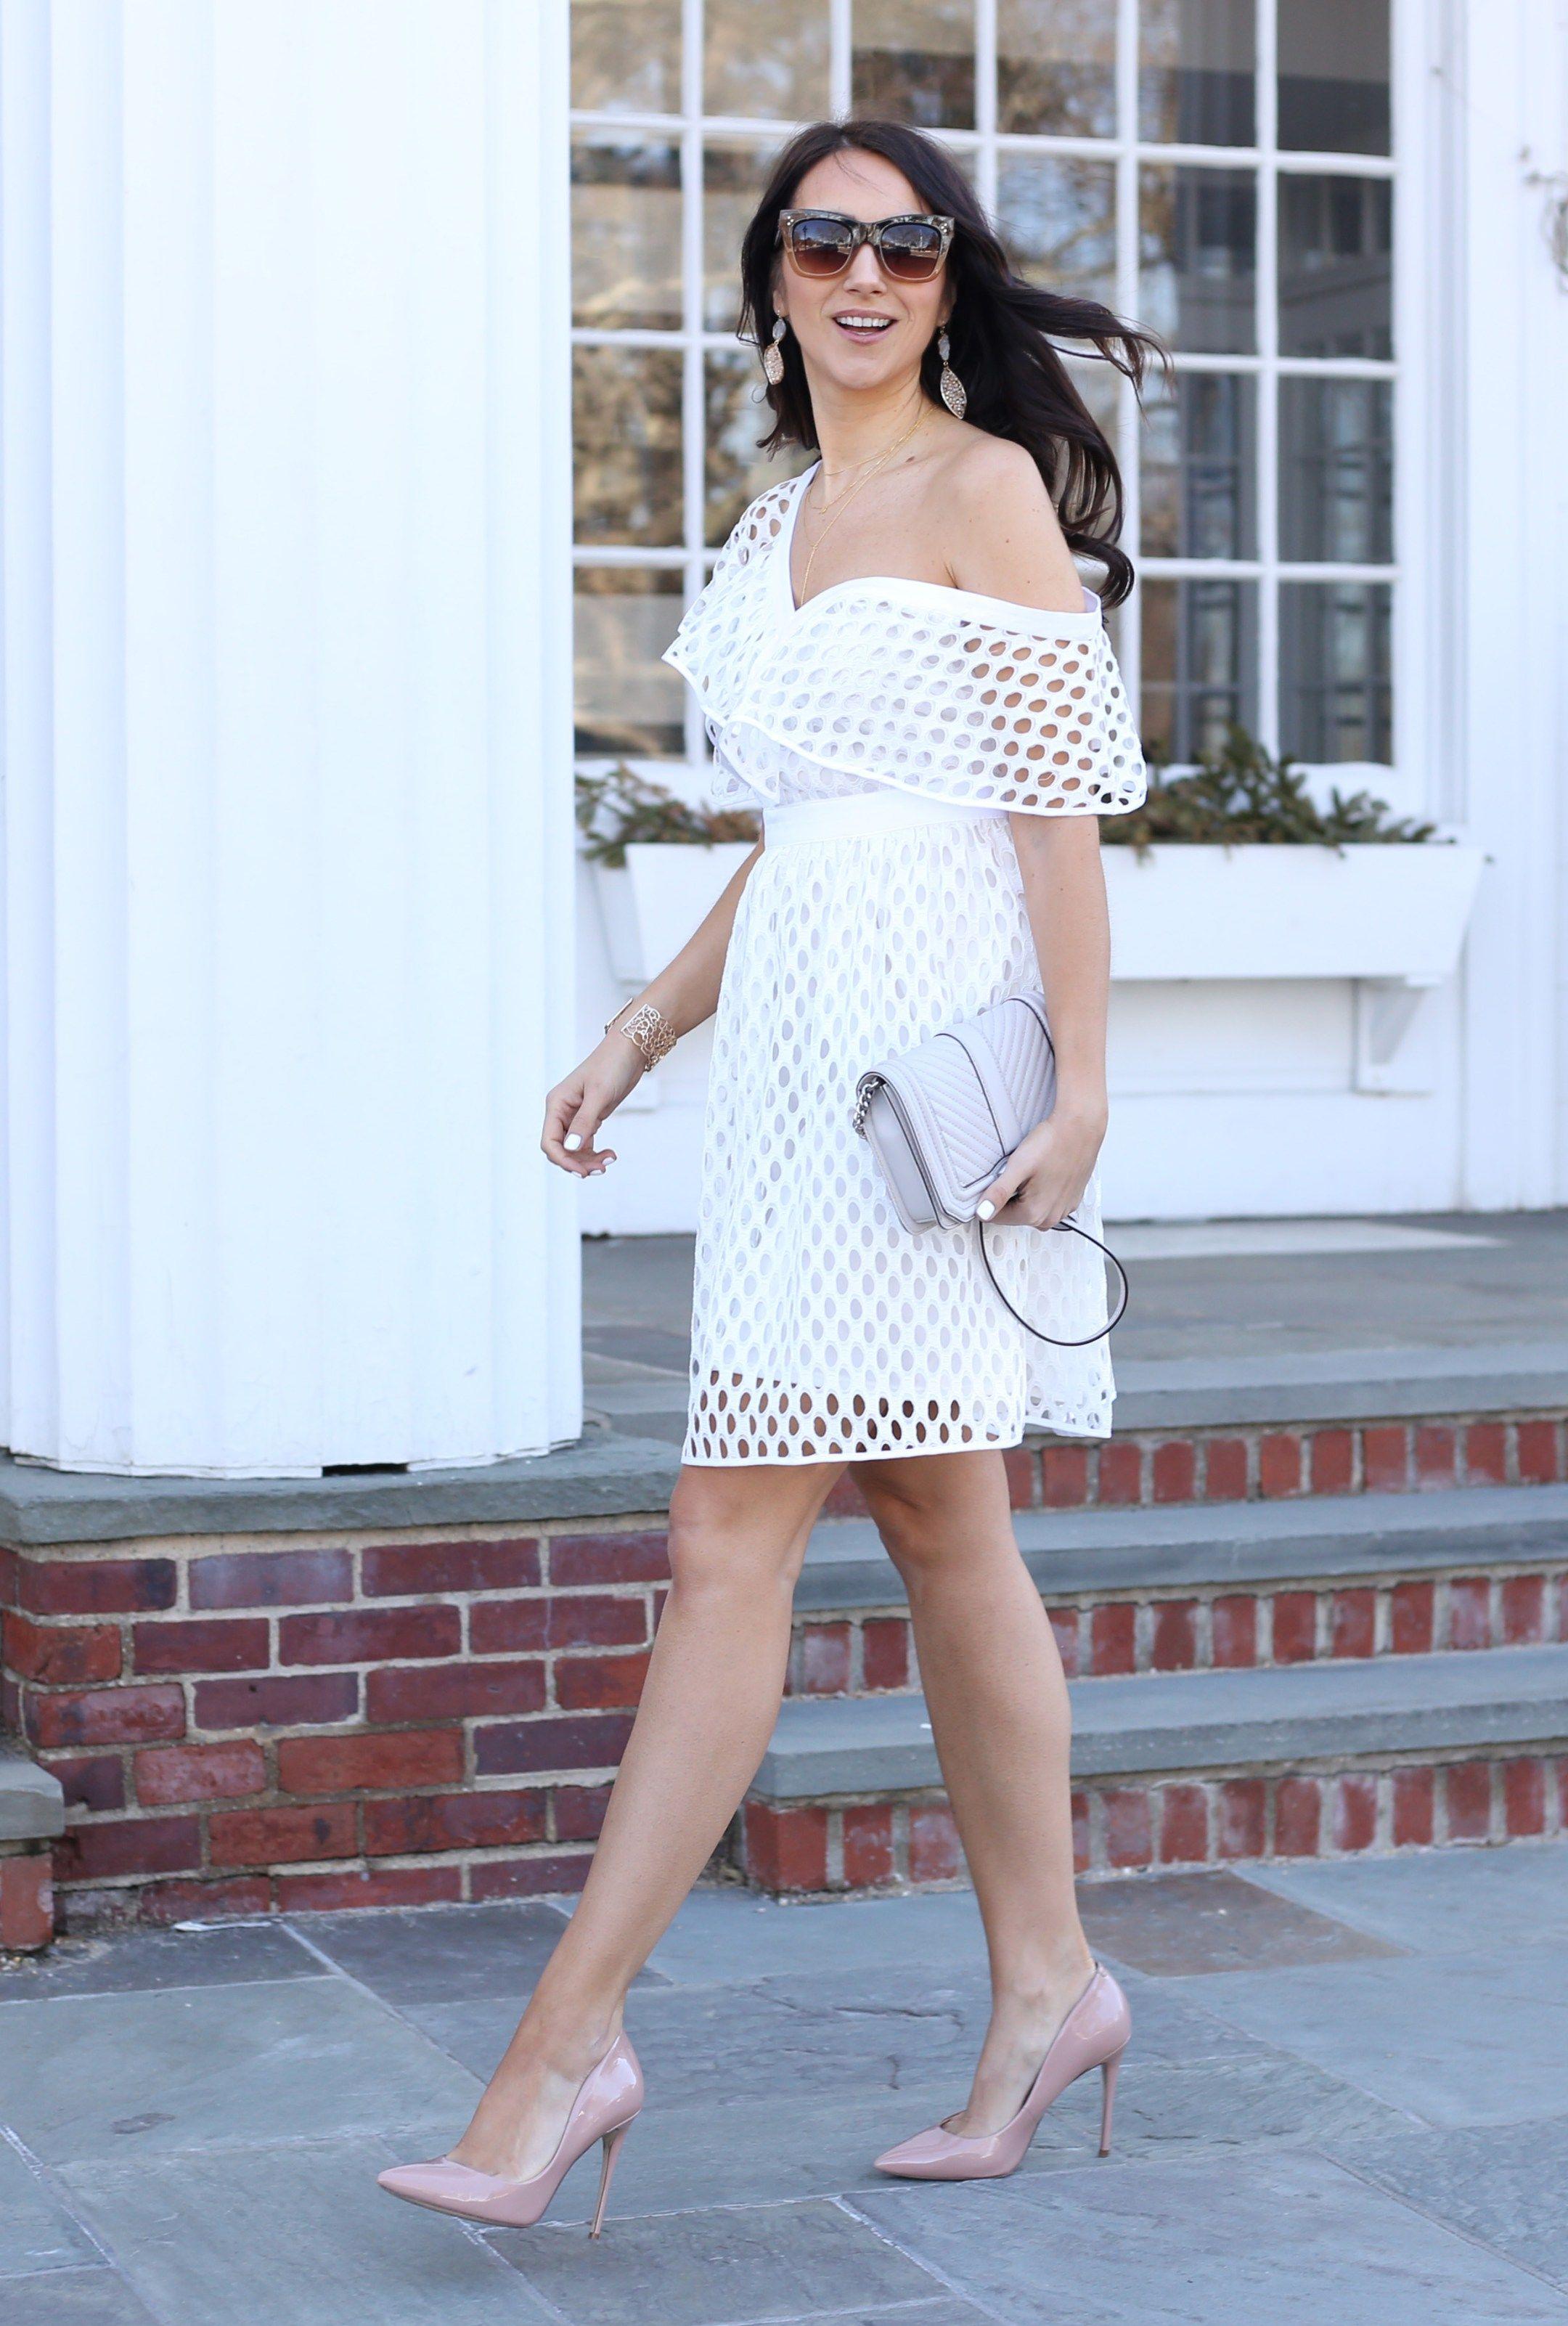 White Dresses For Spring Blushing Rose Style Blog Dinner Outfits Bridal Shower Dress Shower Dress For Bride [ 3204 x 2160 Pixel ]